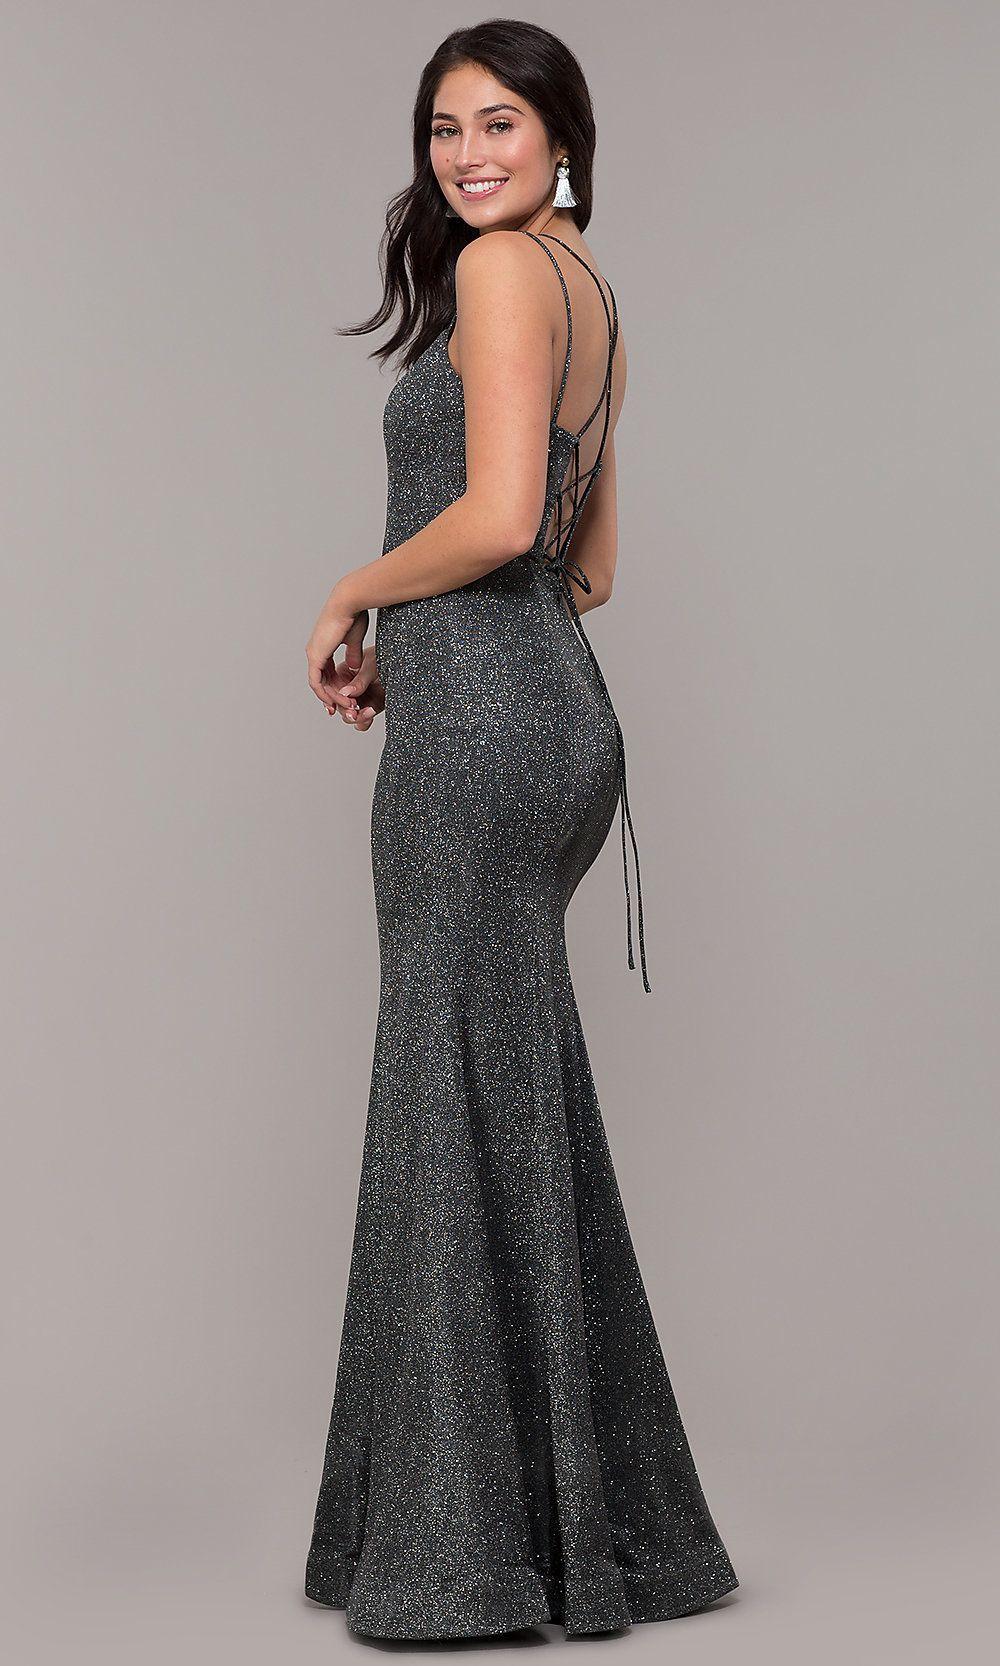 7576d3c9b01a1d Metallic Jersey Lace-Up-Back Mermaid Prom Dress in 2019 | Prom dress ...